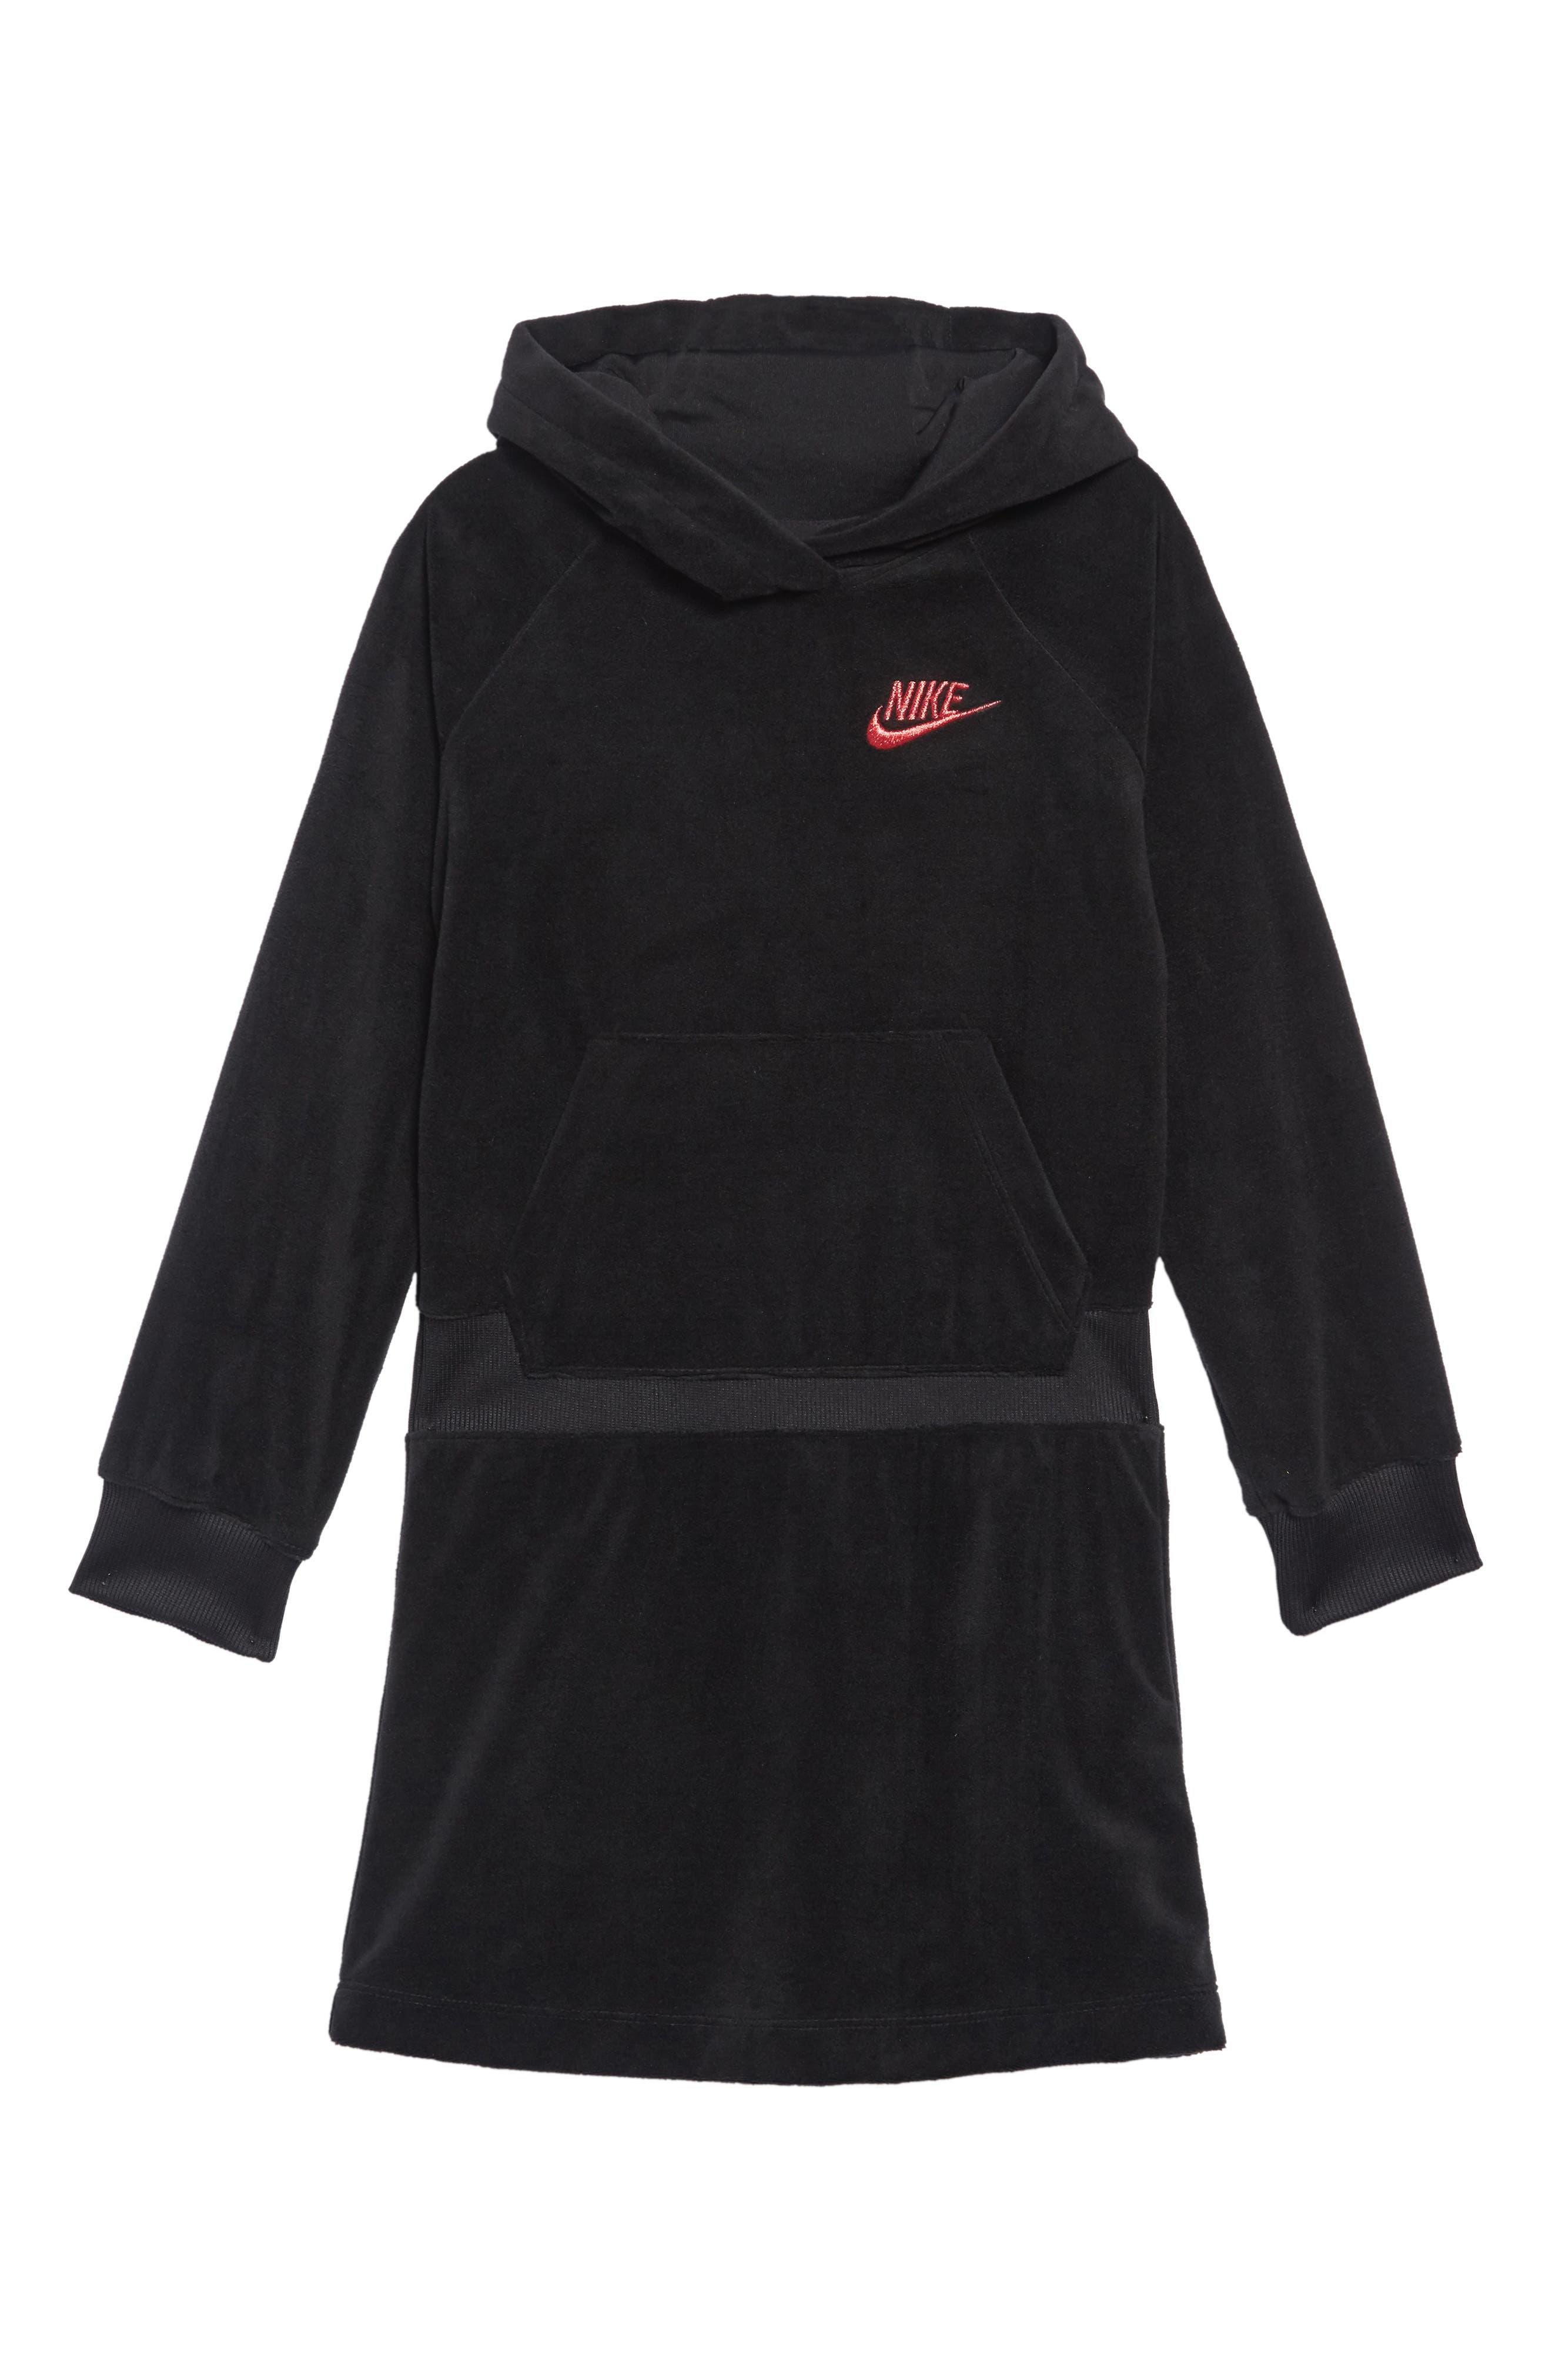 Velour Hooded Sweatshirt Dress,                             Main thumbnail 1, color,                             BLACK